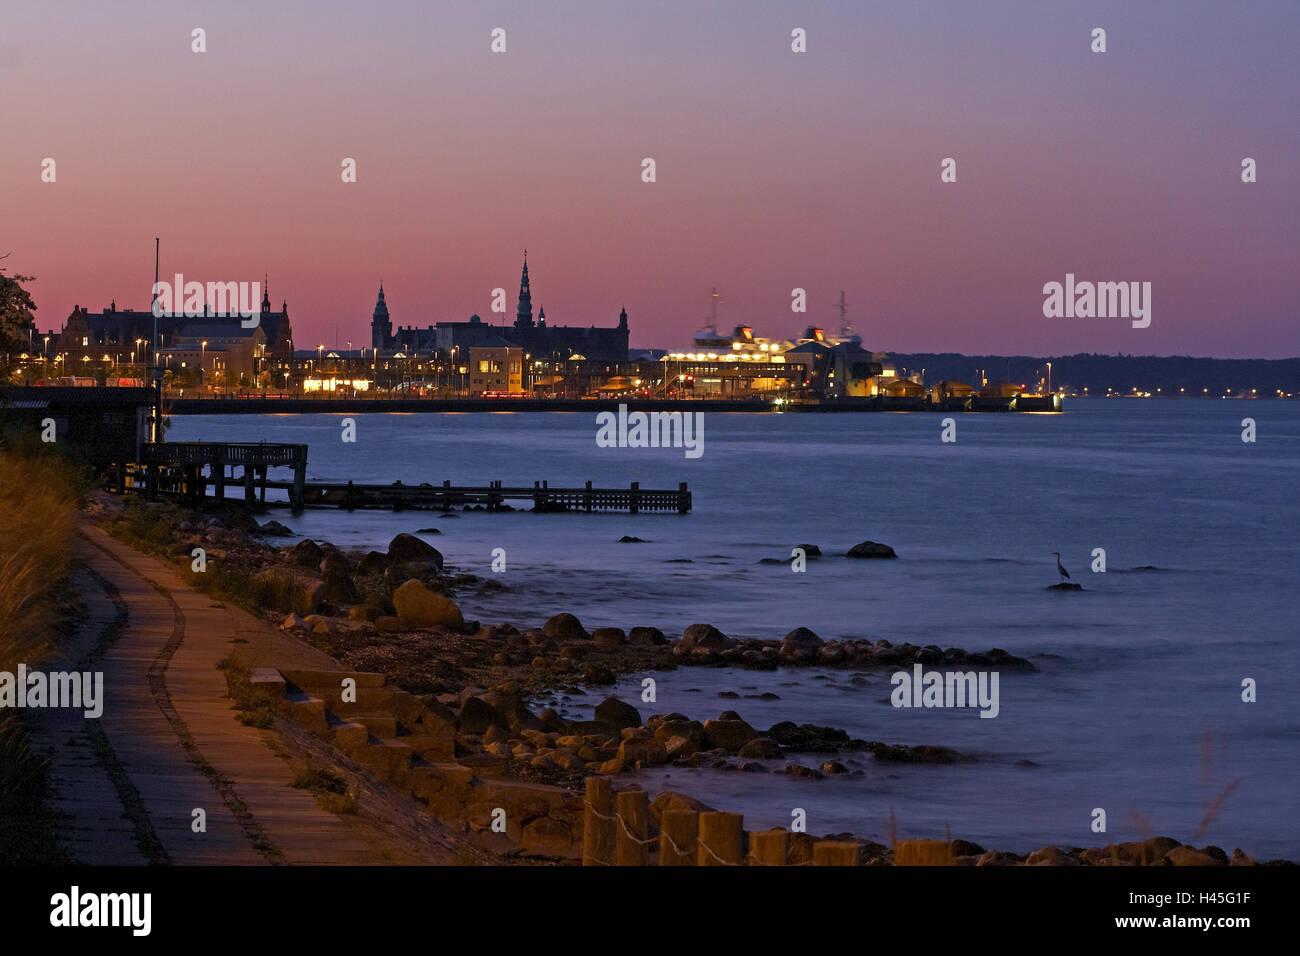 Denmark, Helsingoer, ferry, harbour, evening, fortress Castle Kron, - Stock Image